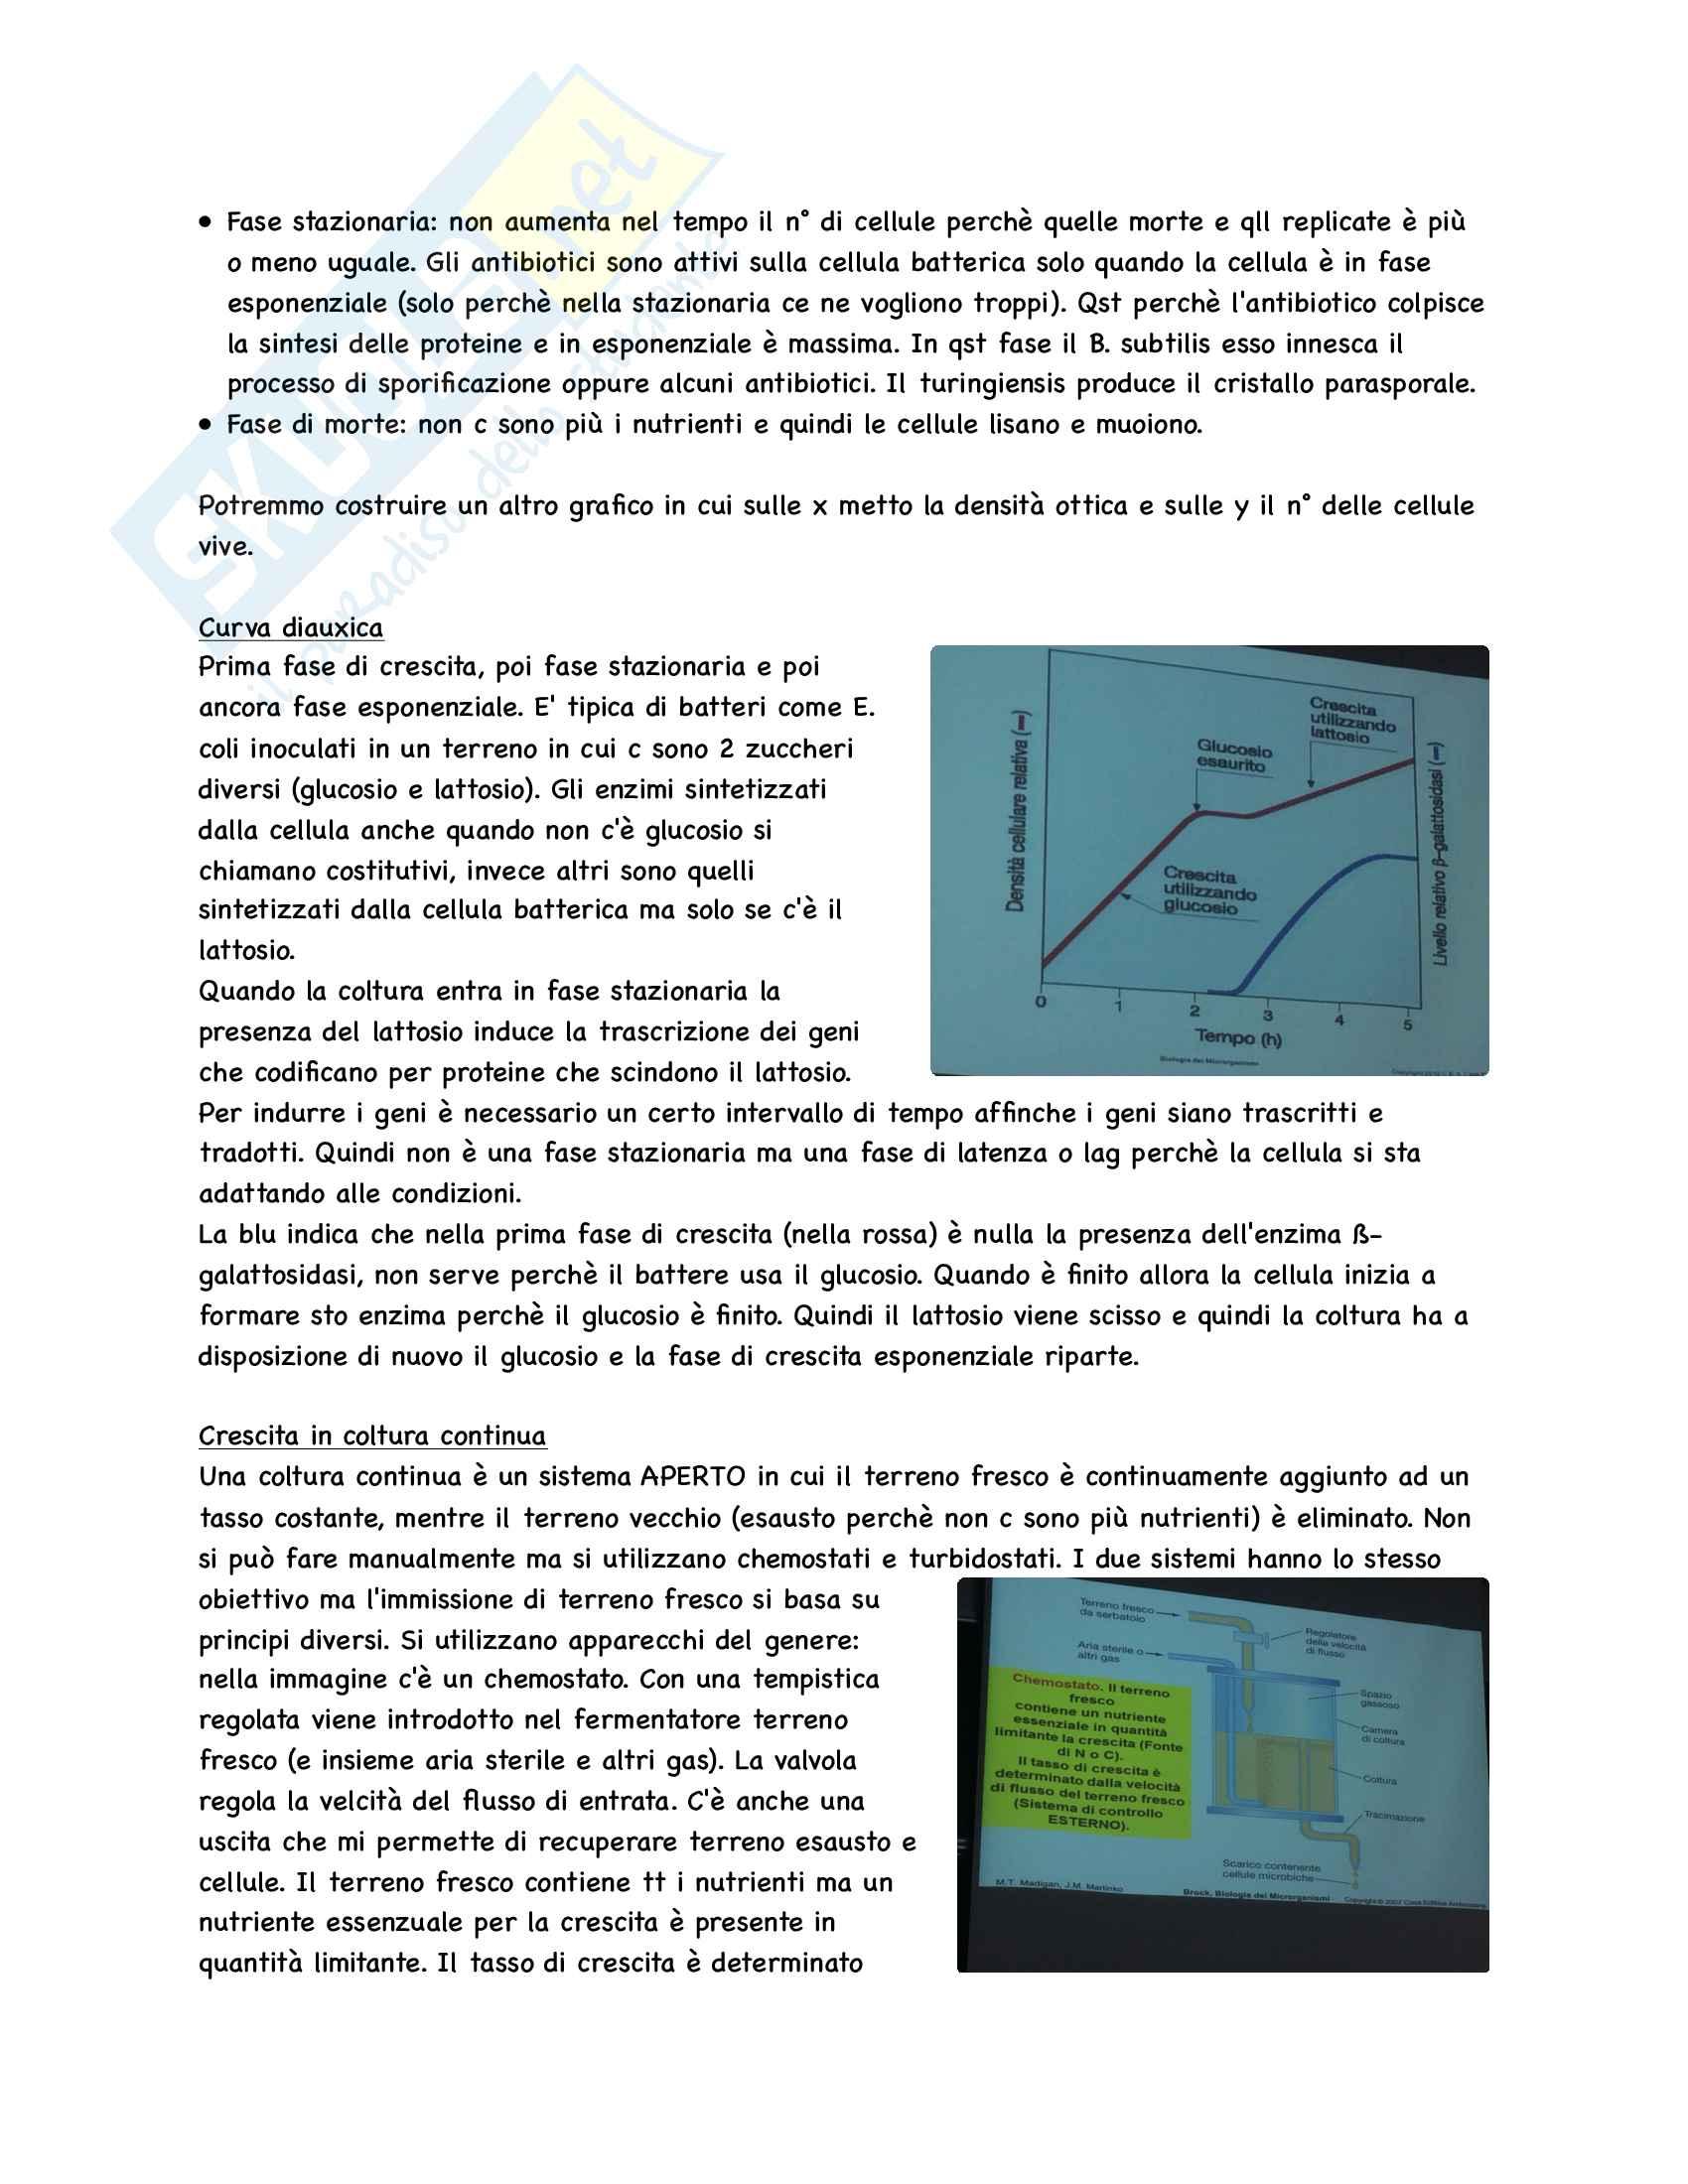 Microbiologia Appunti Parte 1 Pag. 41